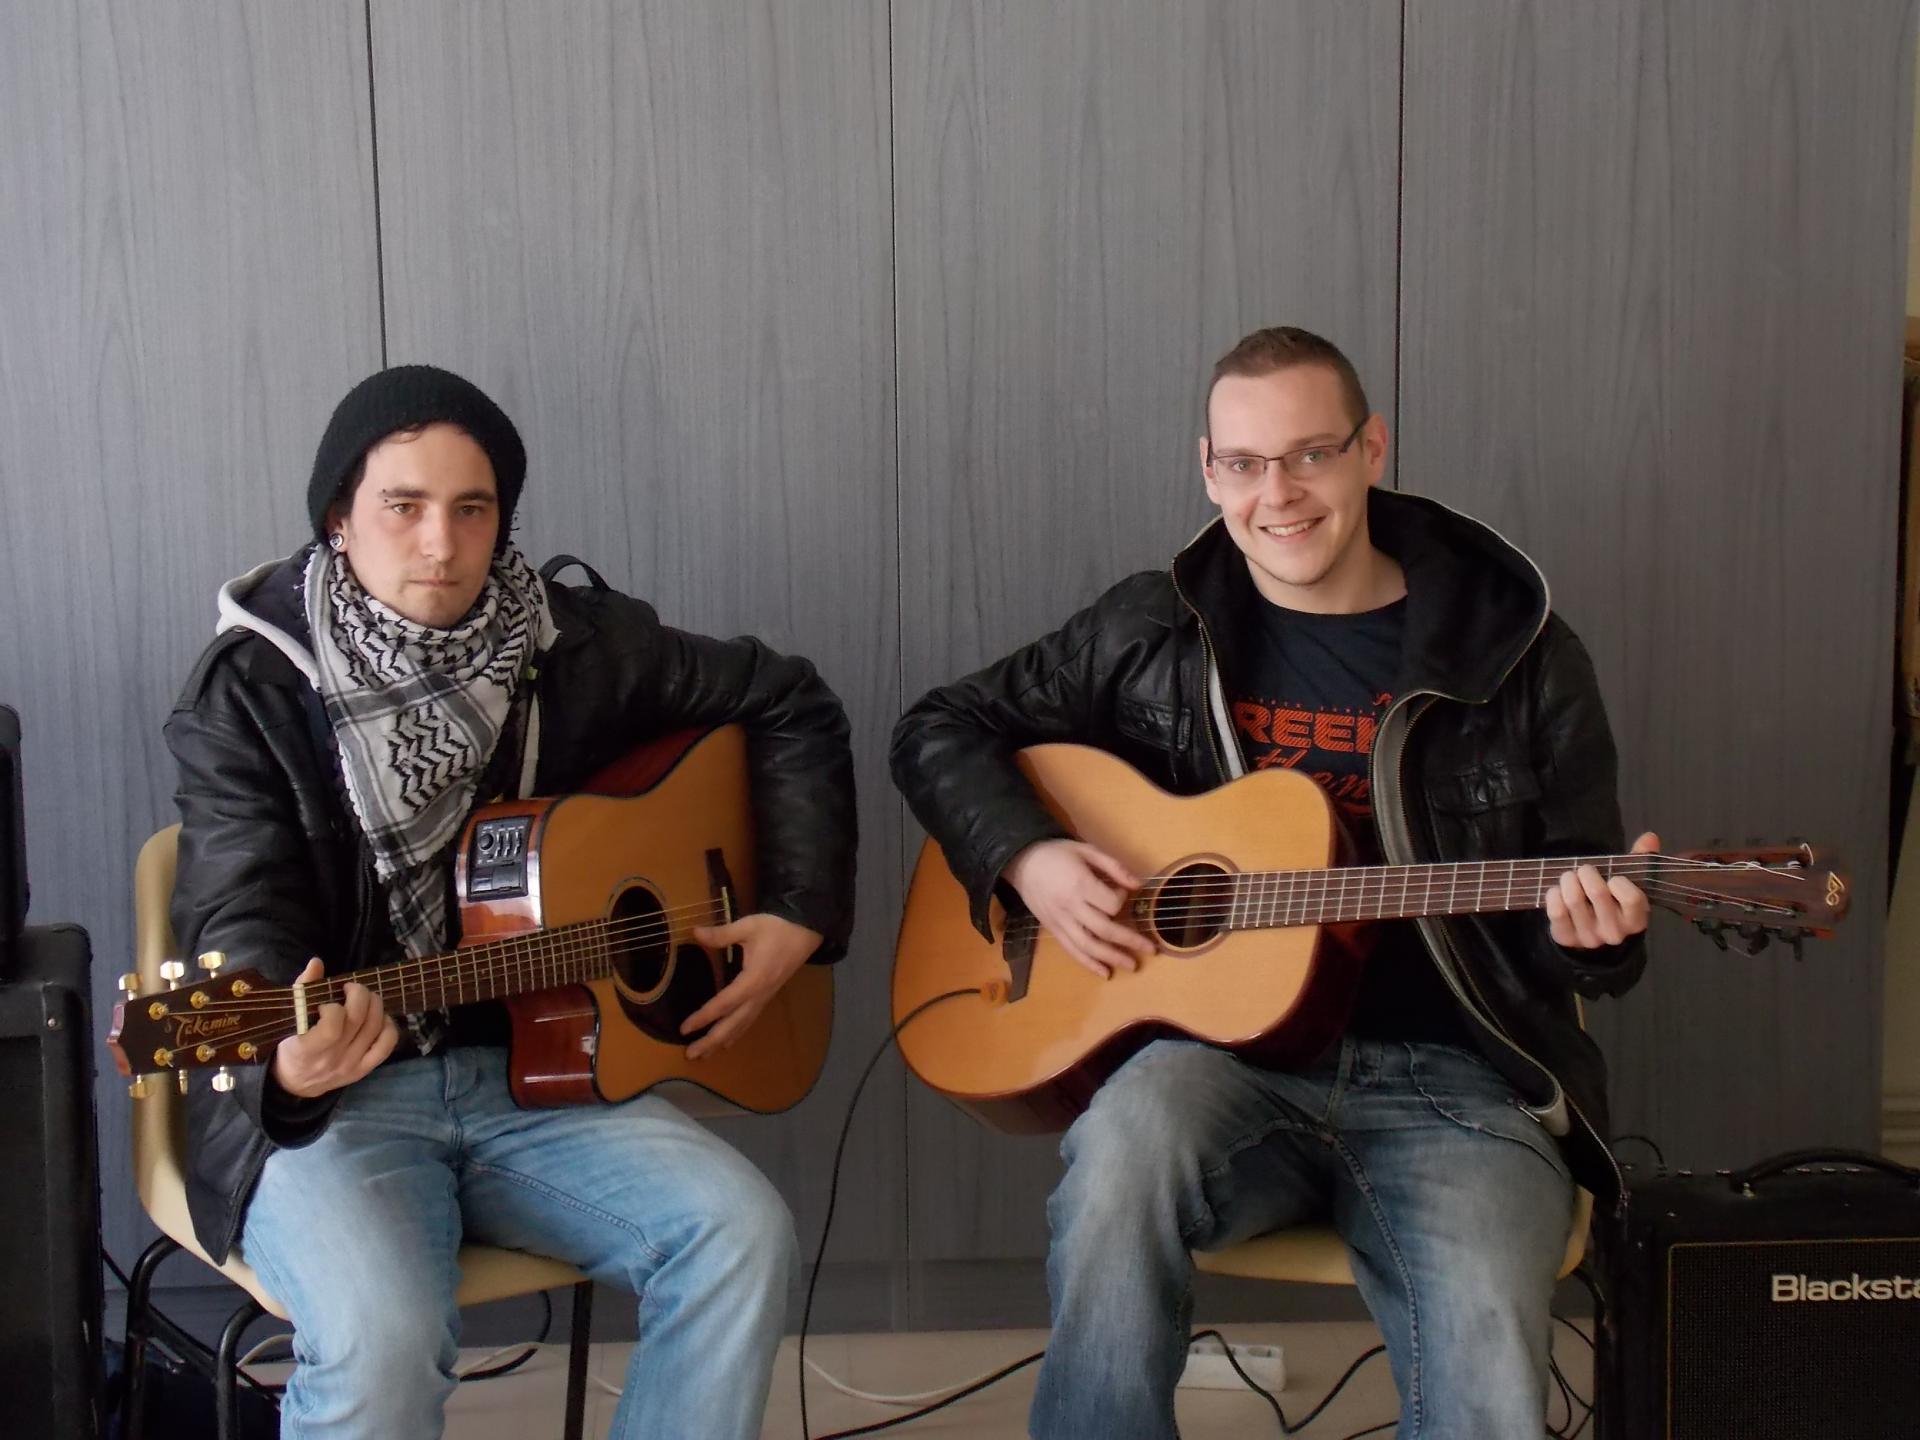 ...guitaristes bénévoles.